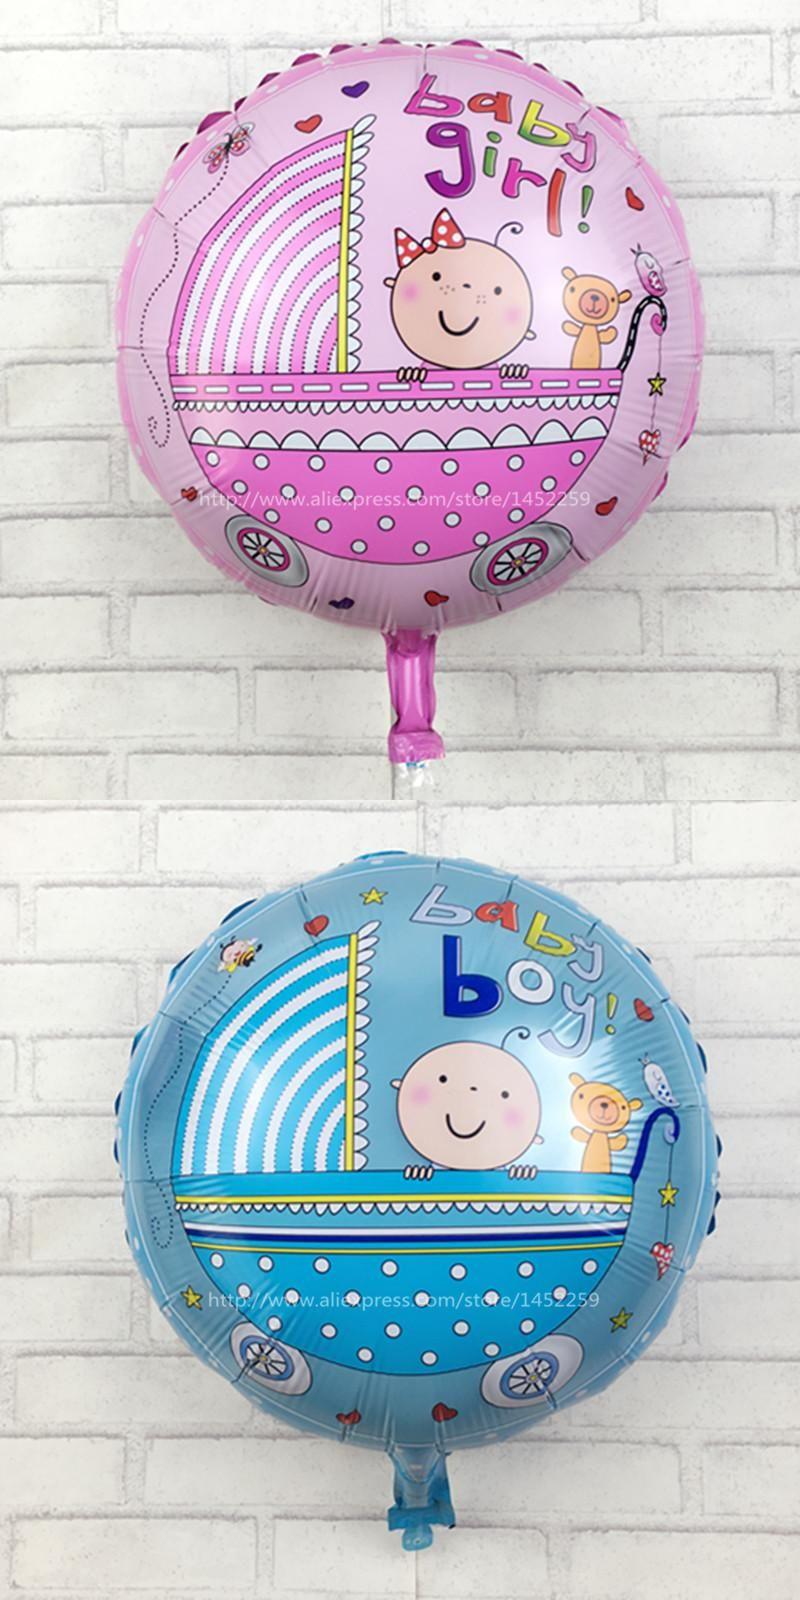 XXPWJ5pcs Lots Trade New Helium Balloon Birthday Party Decorations Balloons Wholesale Aluminum Round Baby Gender L 006